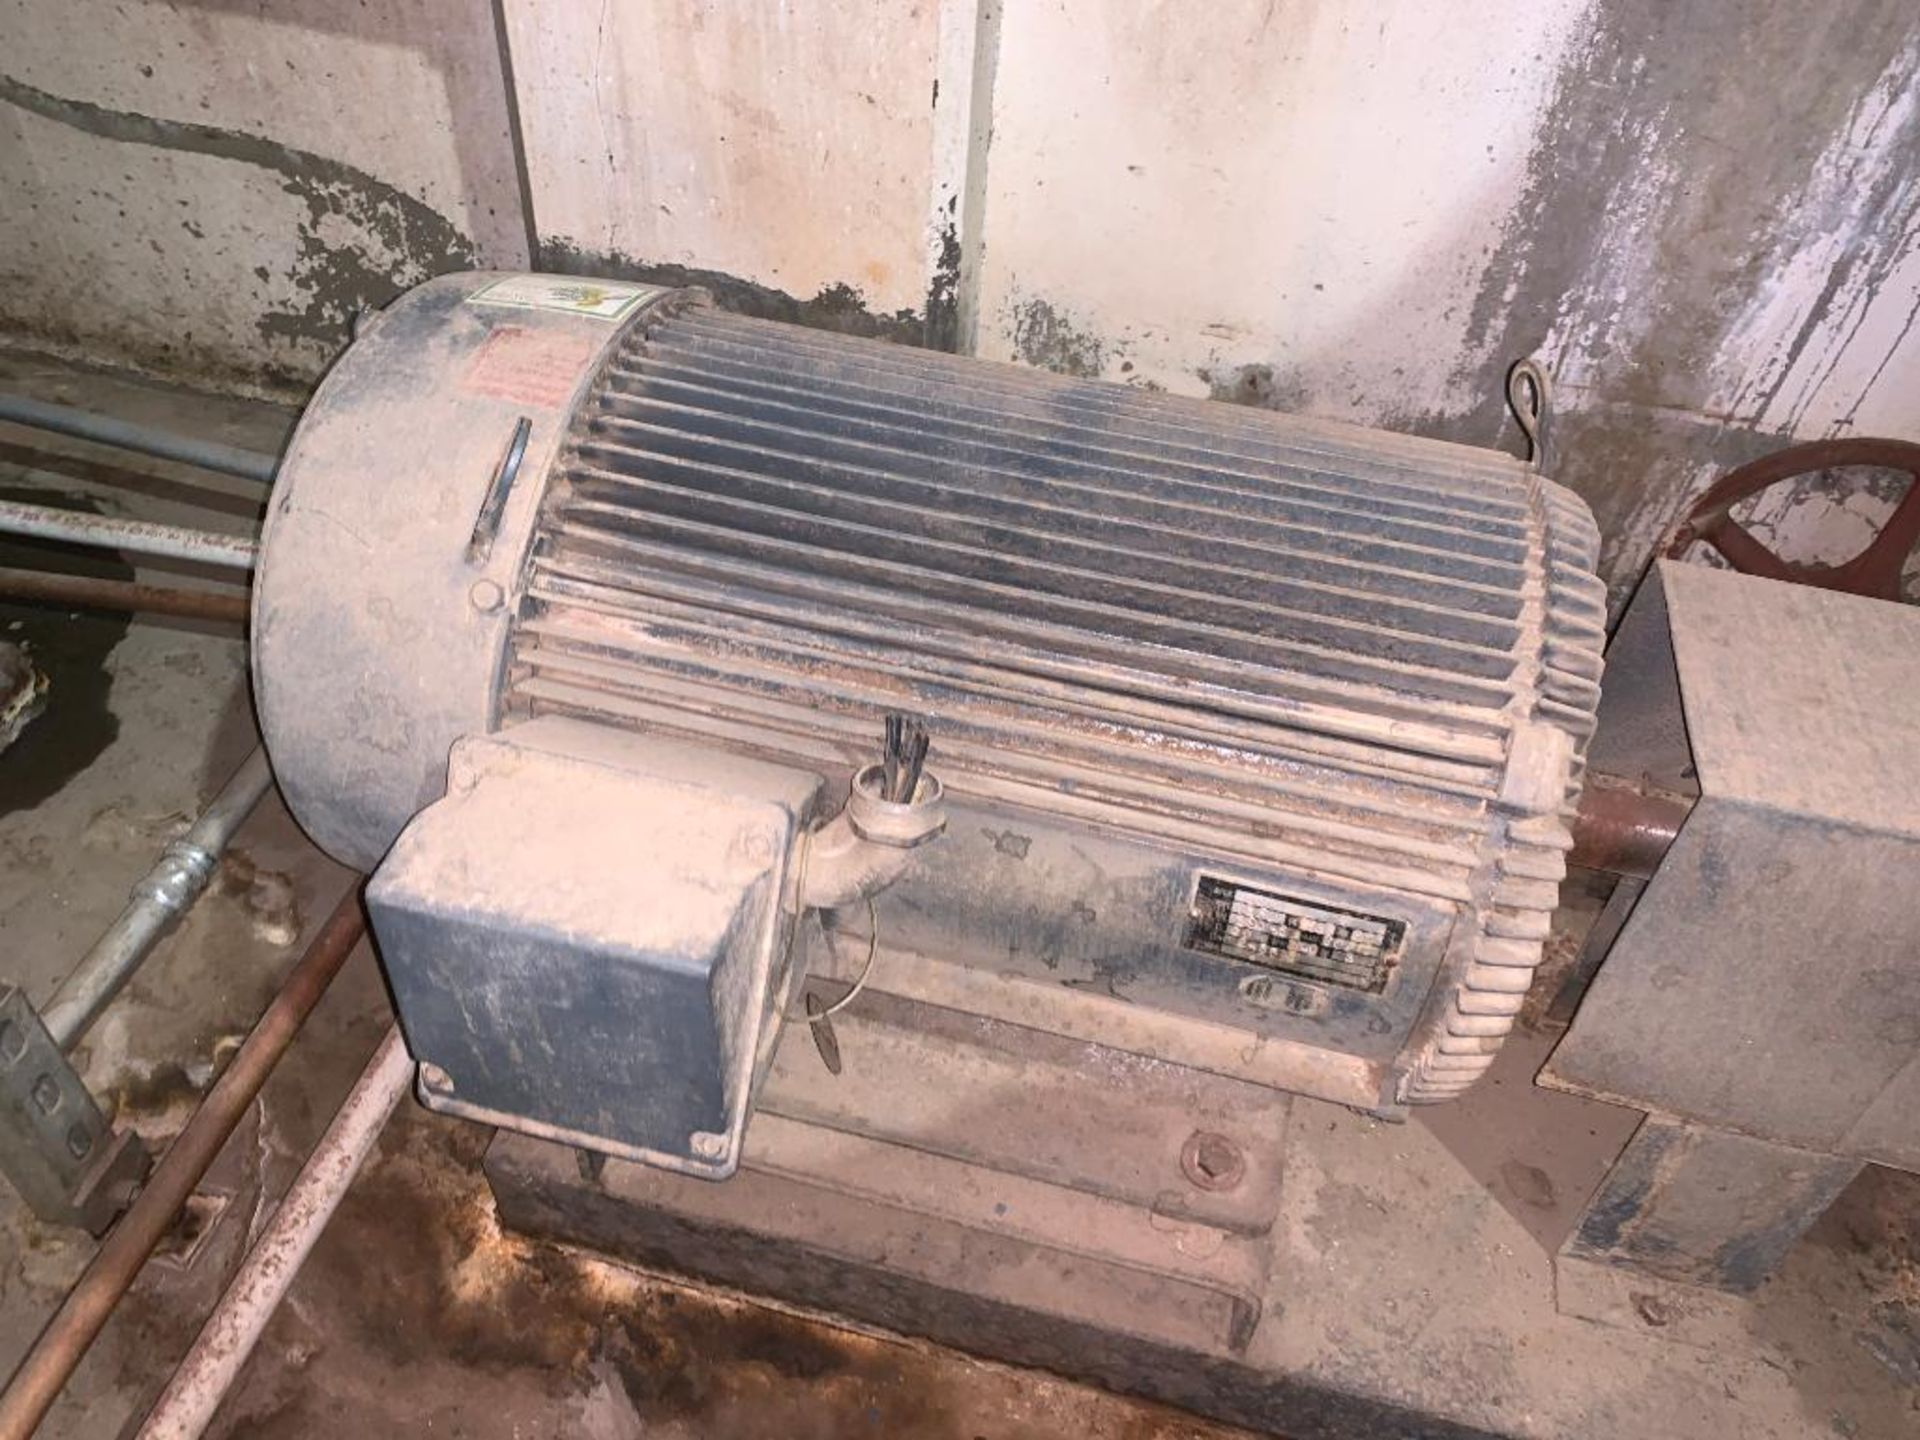 Ingersoll Dresser high temperature water pump - Image 2 of 5